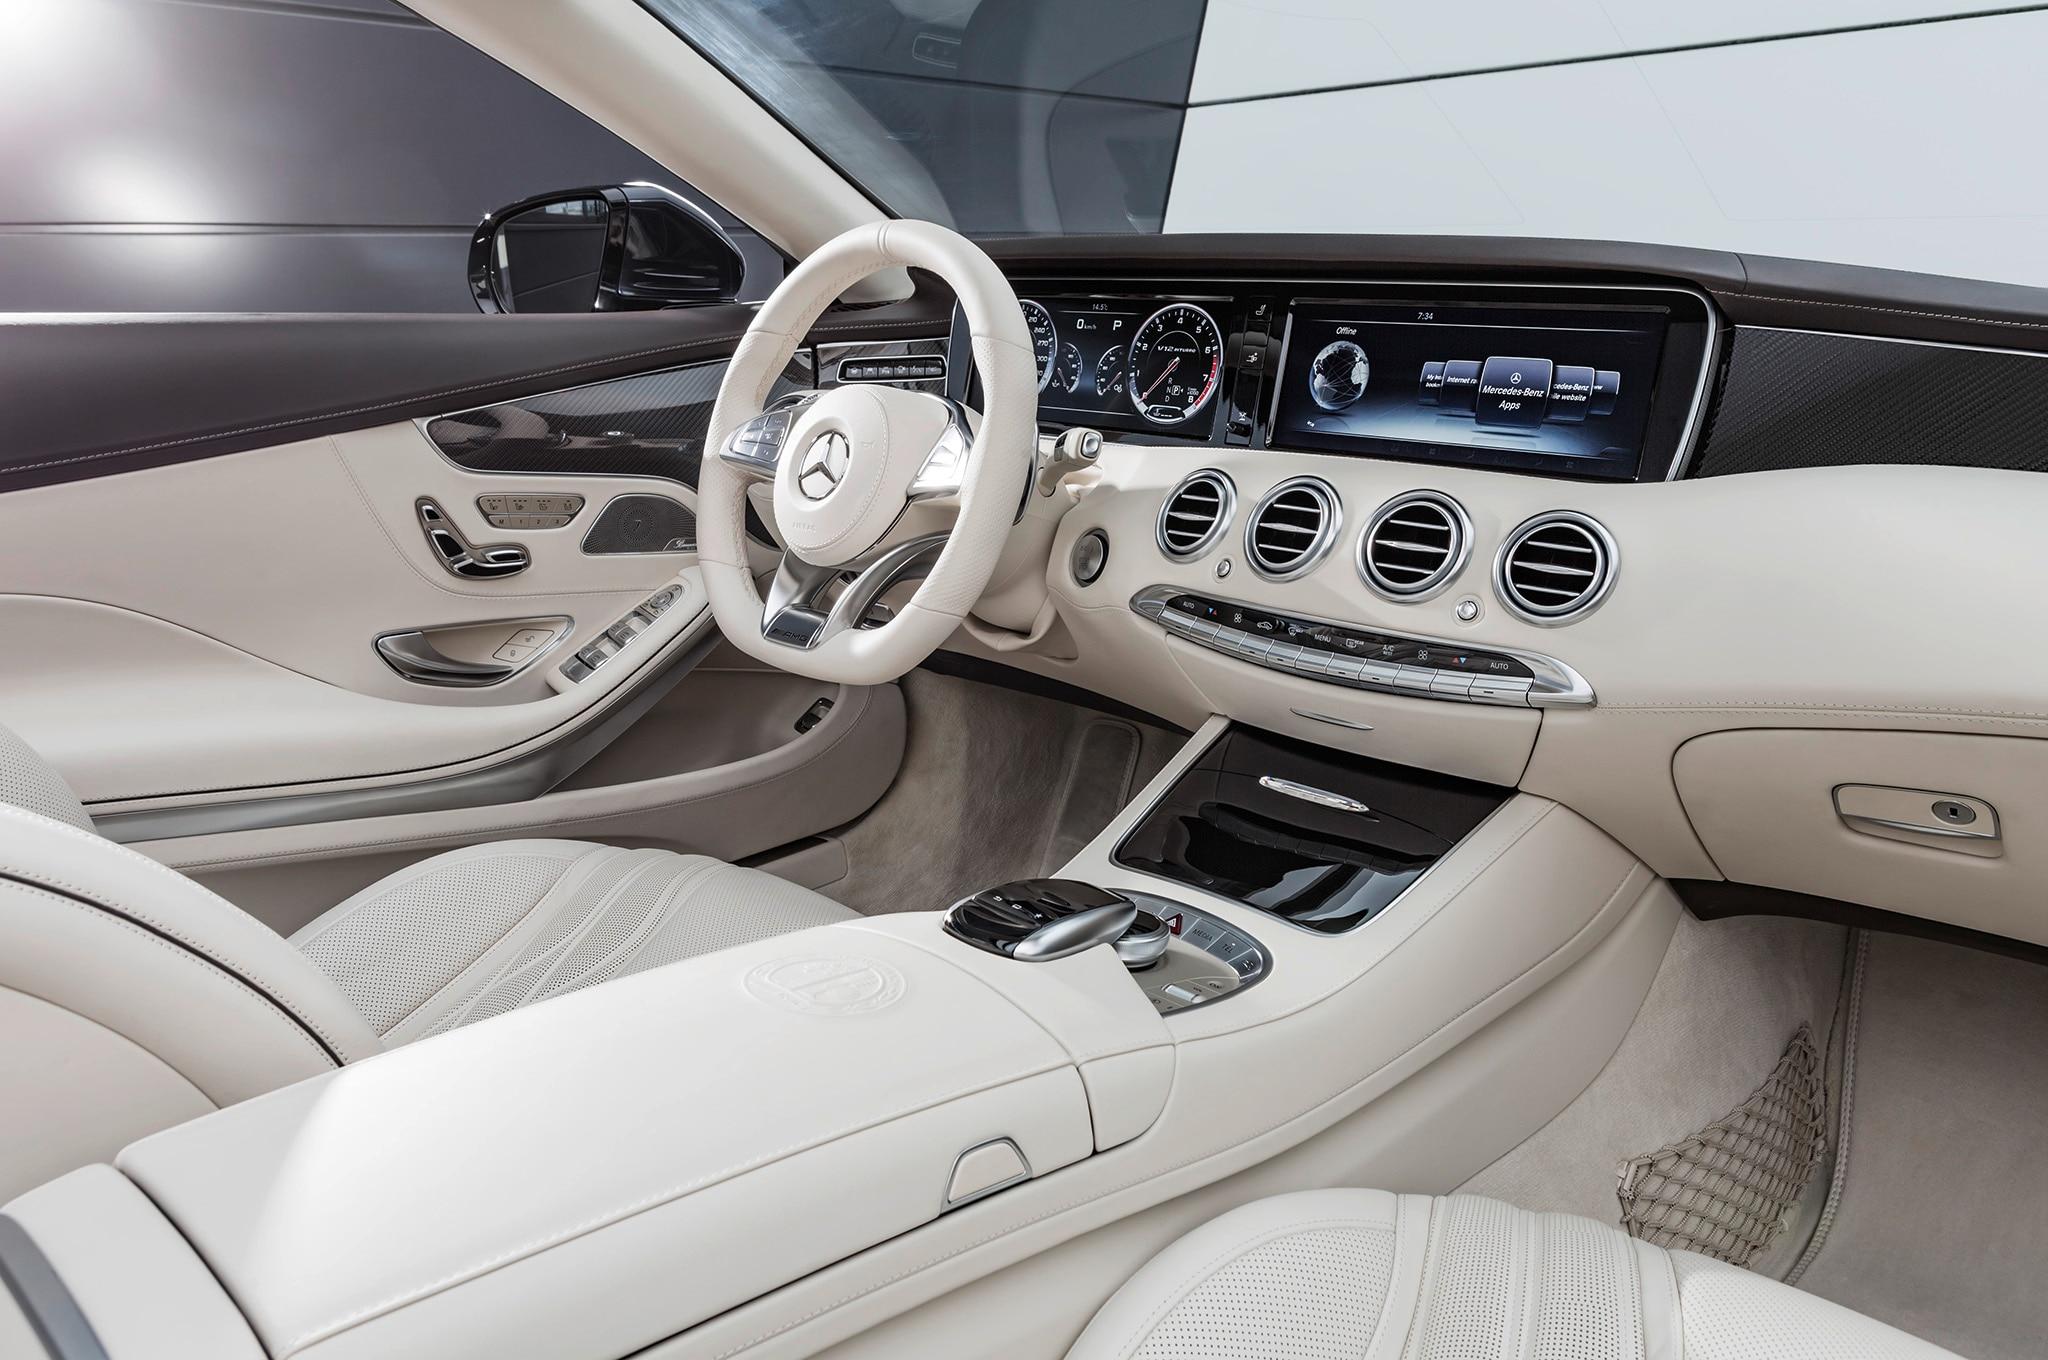 2017 mercedes benz s550 cabriolet interior 02 - Show More